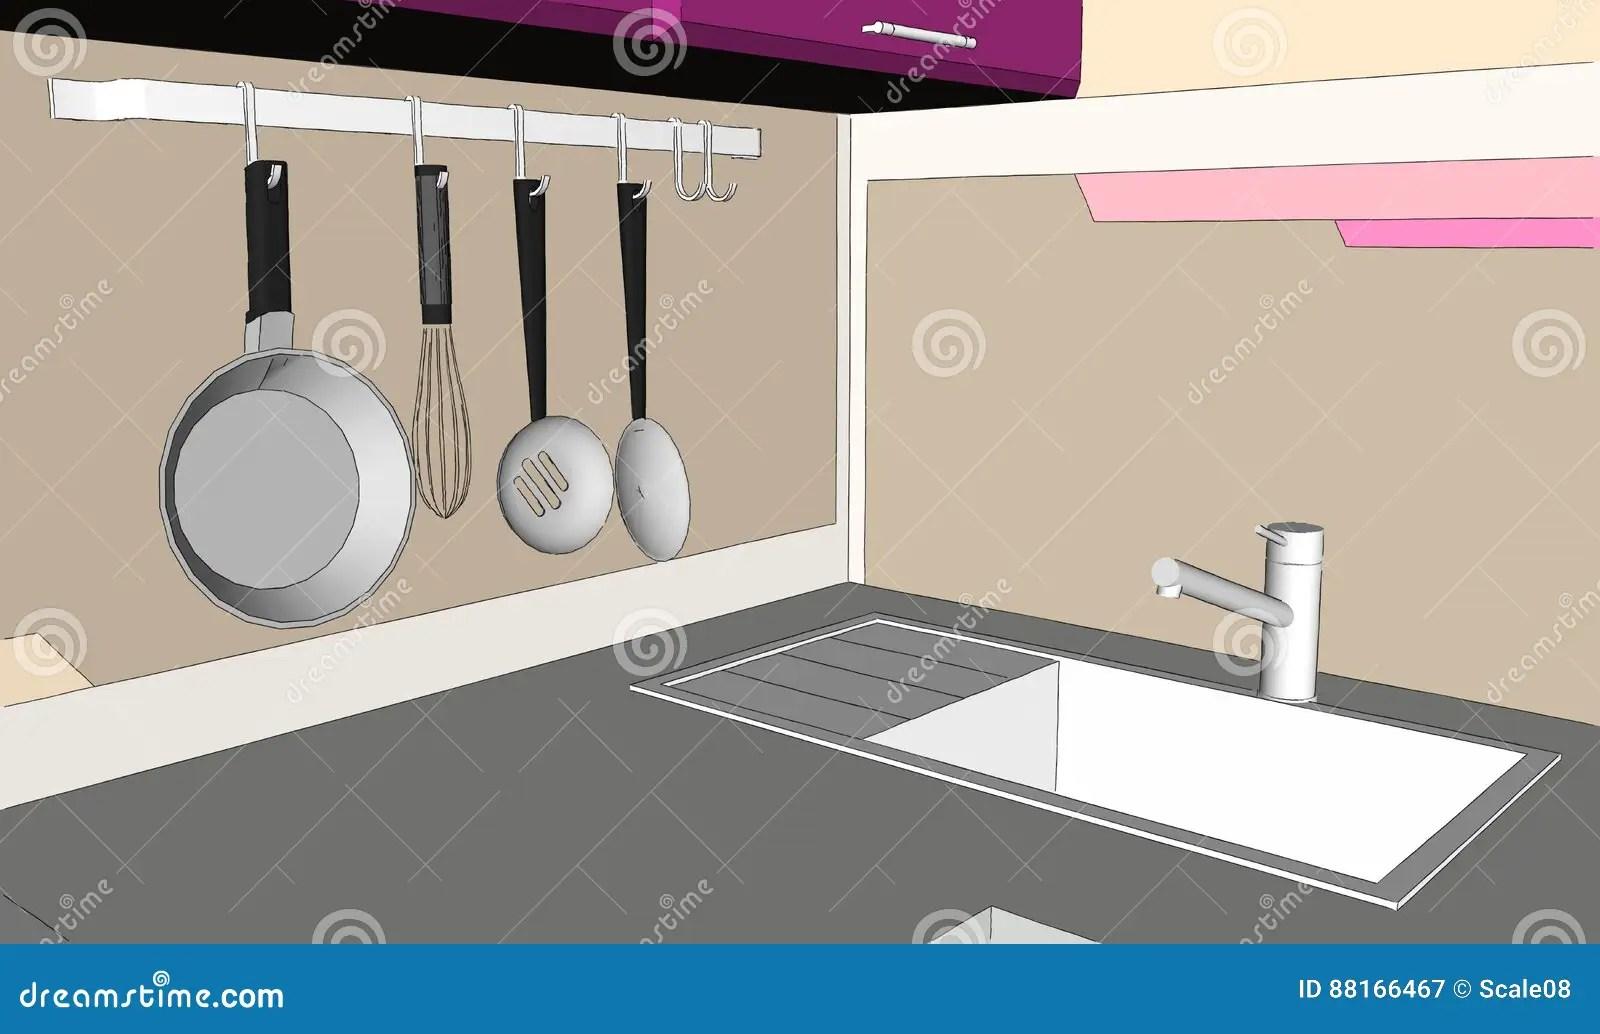 kitchen corner sinks themed decor 3d紫色和棕色厨房角落略图与水槽和墙壁罐机架的库存例证 插画包括有逗人 3d紫色和棕色厨房角落略图与水槽和墙壁罐机架的